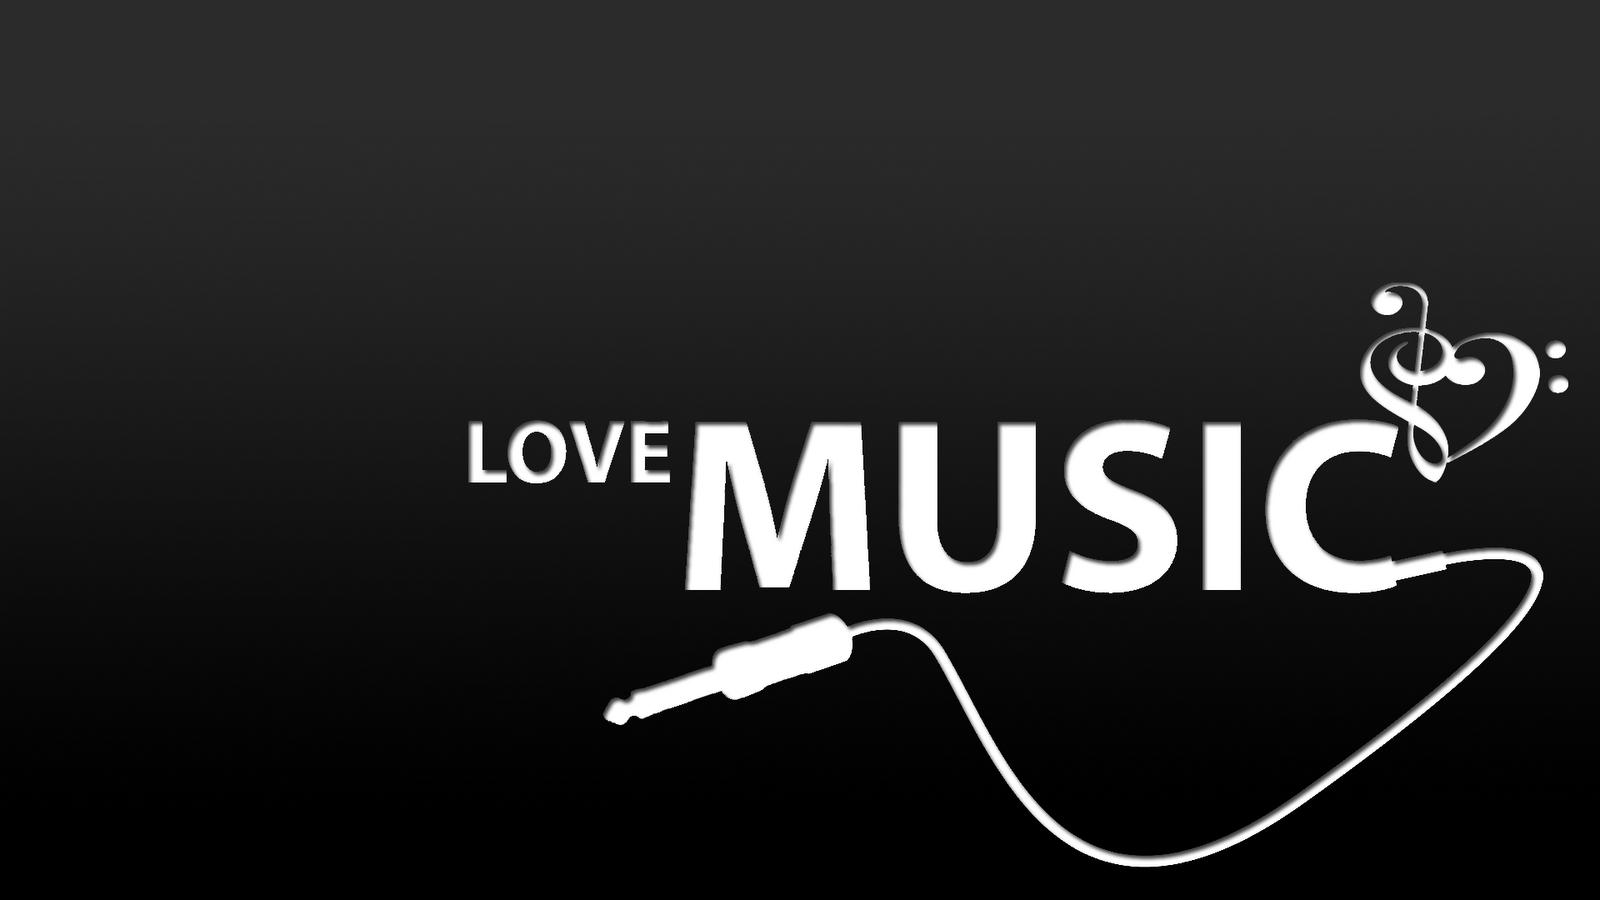 HD Wallpapers: Love Music